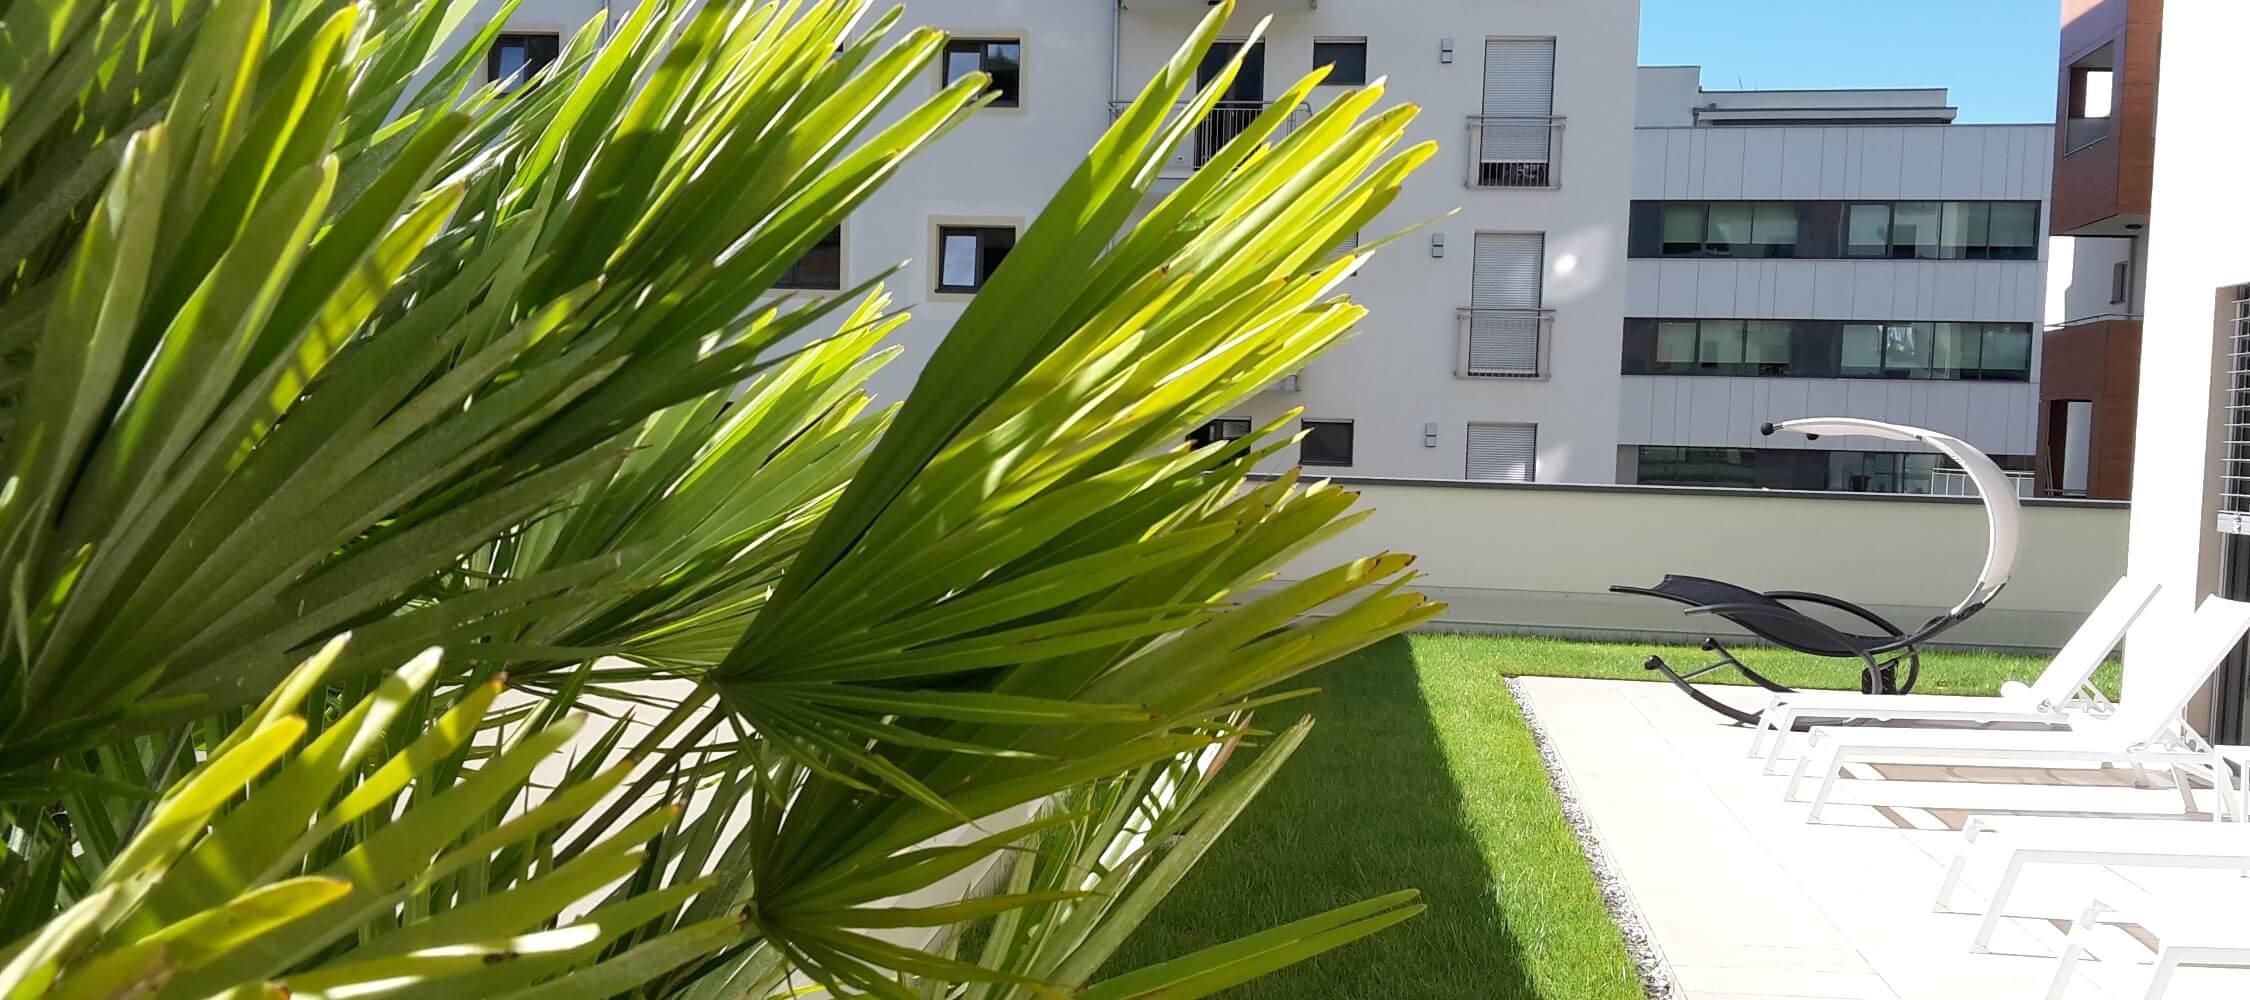 City_Hotel_Merano_Spa_Terrasse_Anguane_20160806_094234_2250x1000